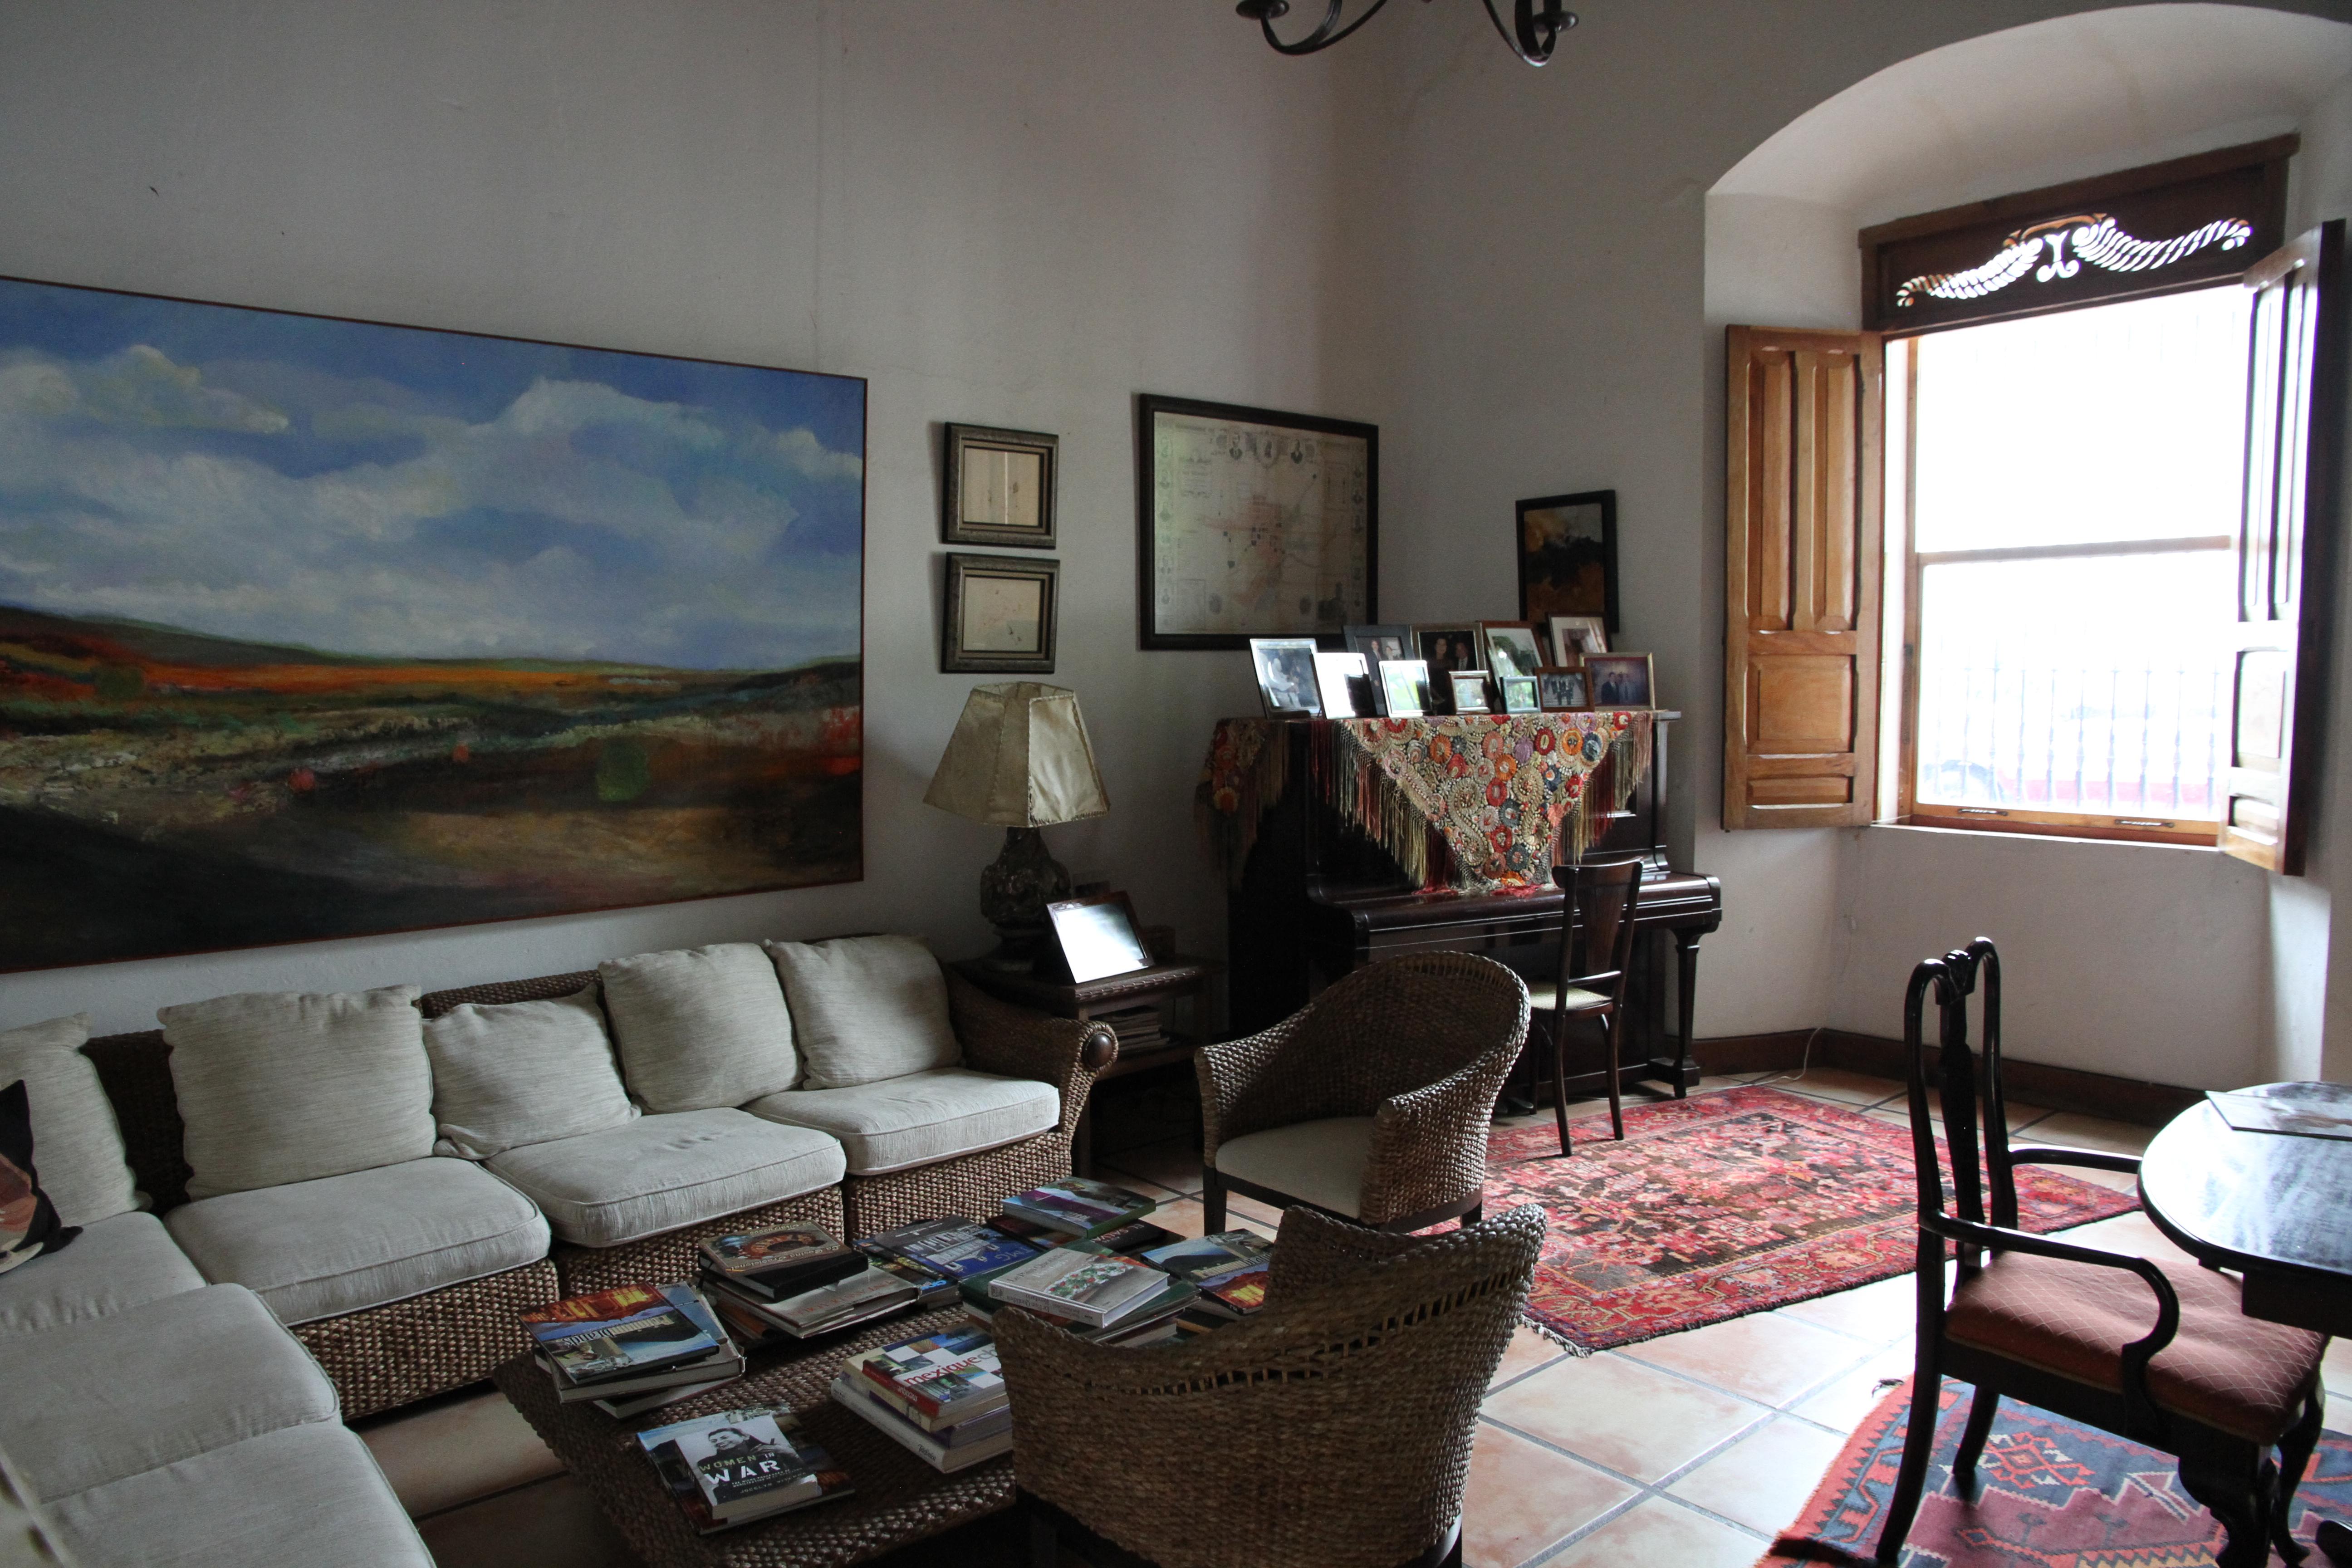 Indigo, Reisen, Reisefeder, travel, travelblog, Reiseblog, Zentralamerika, El Salvador, Suchitoto, Hotel